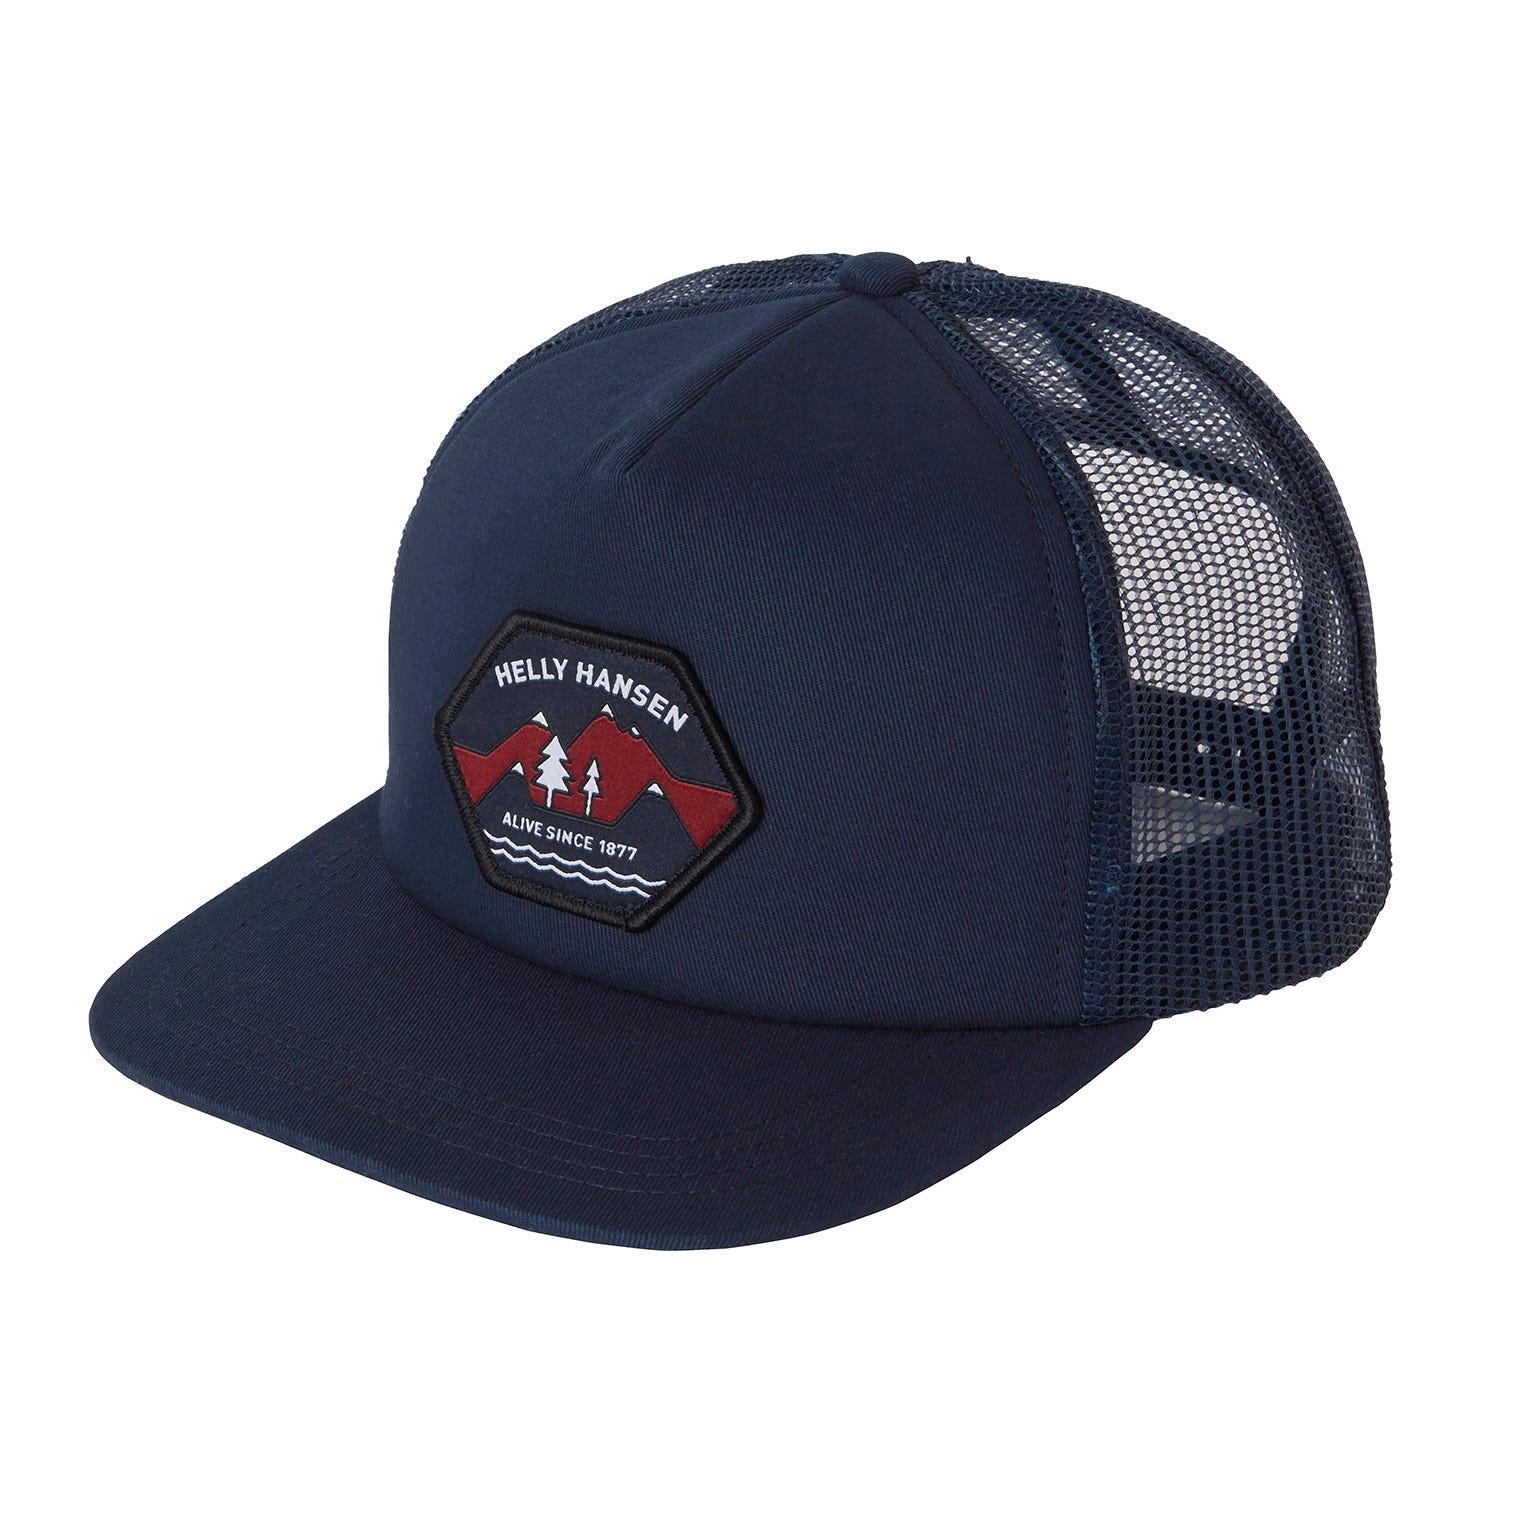 Helly Hansen Unisex Flatbrim Trucker Kappe Flatbrim Trucker Cap